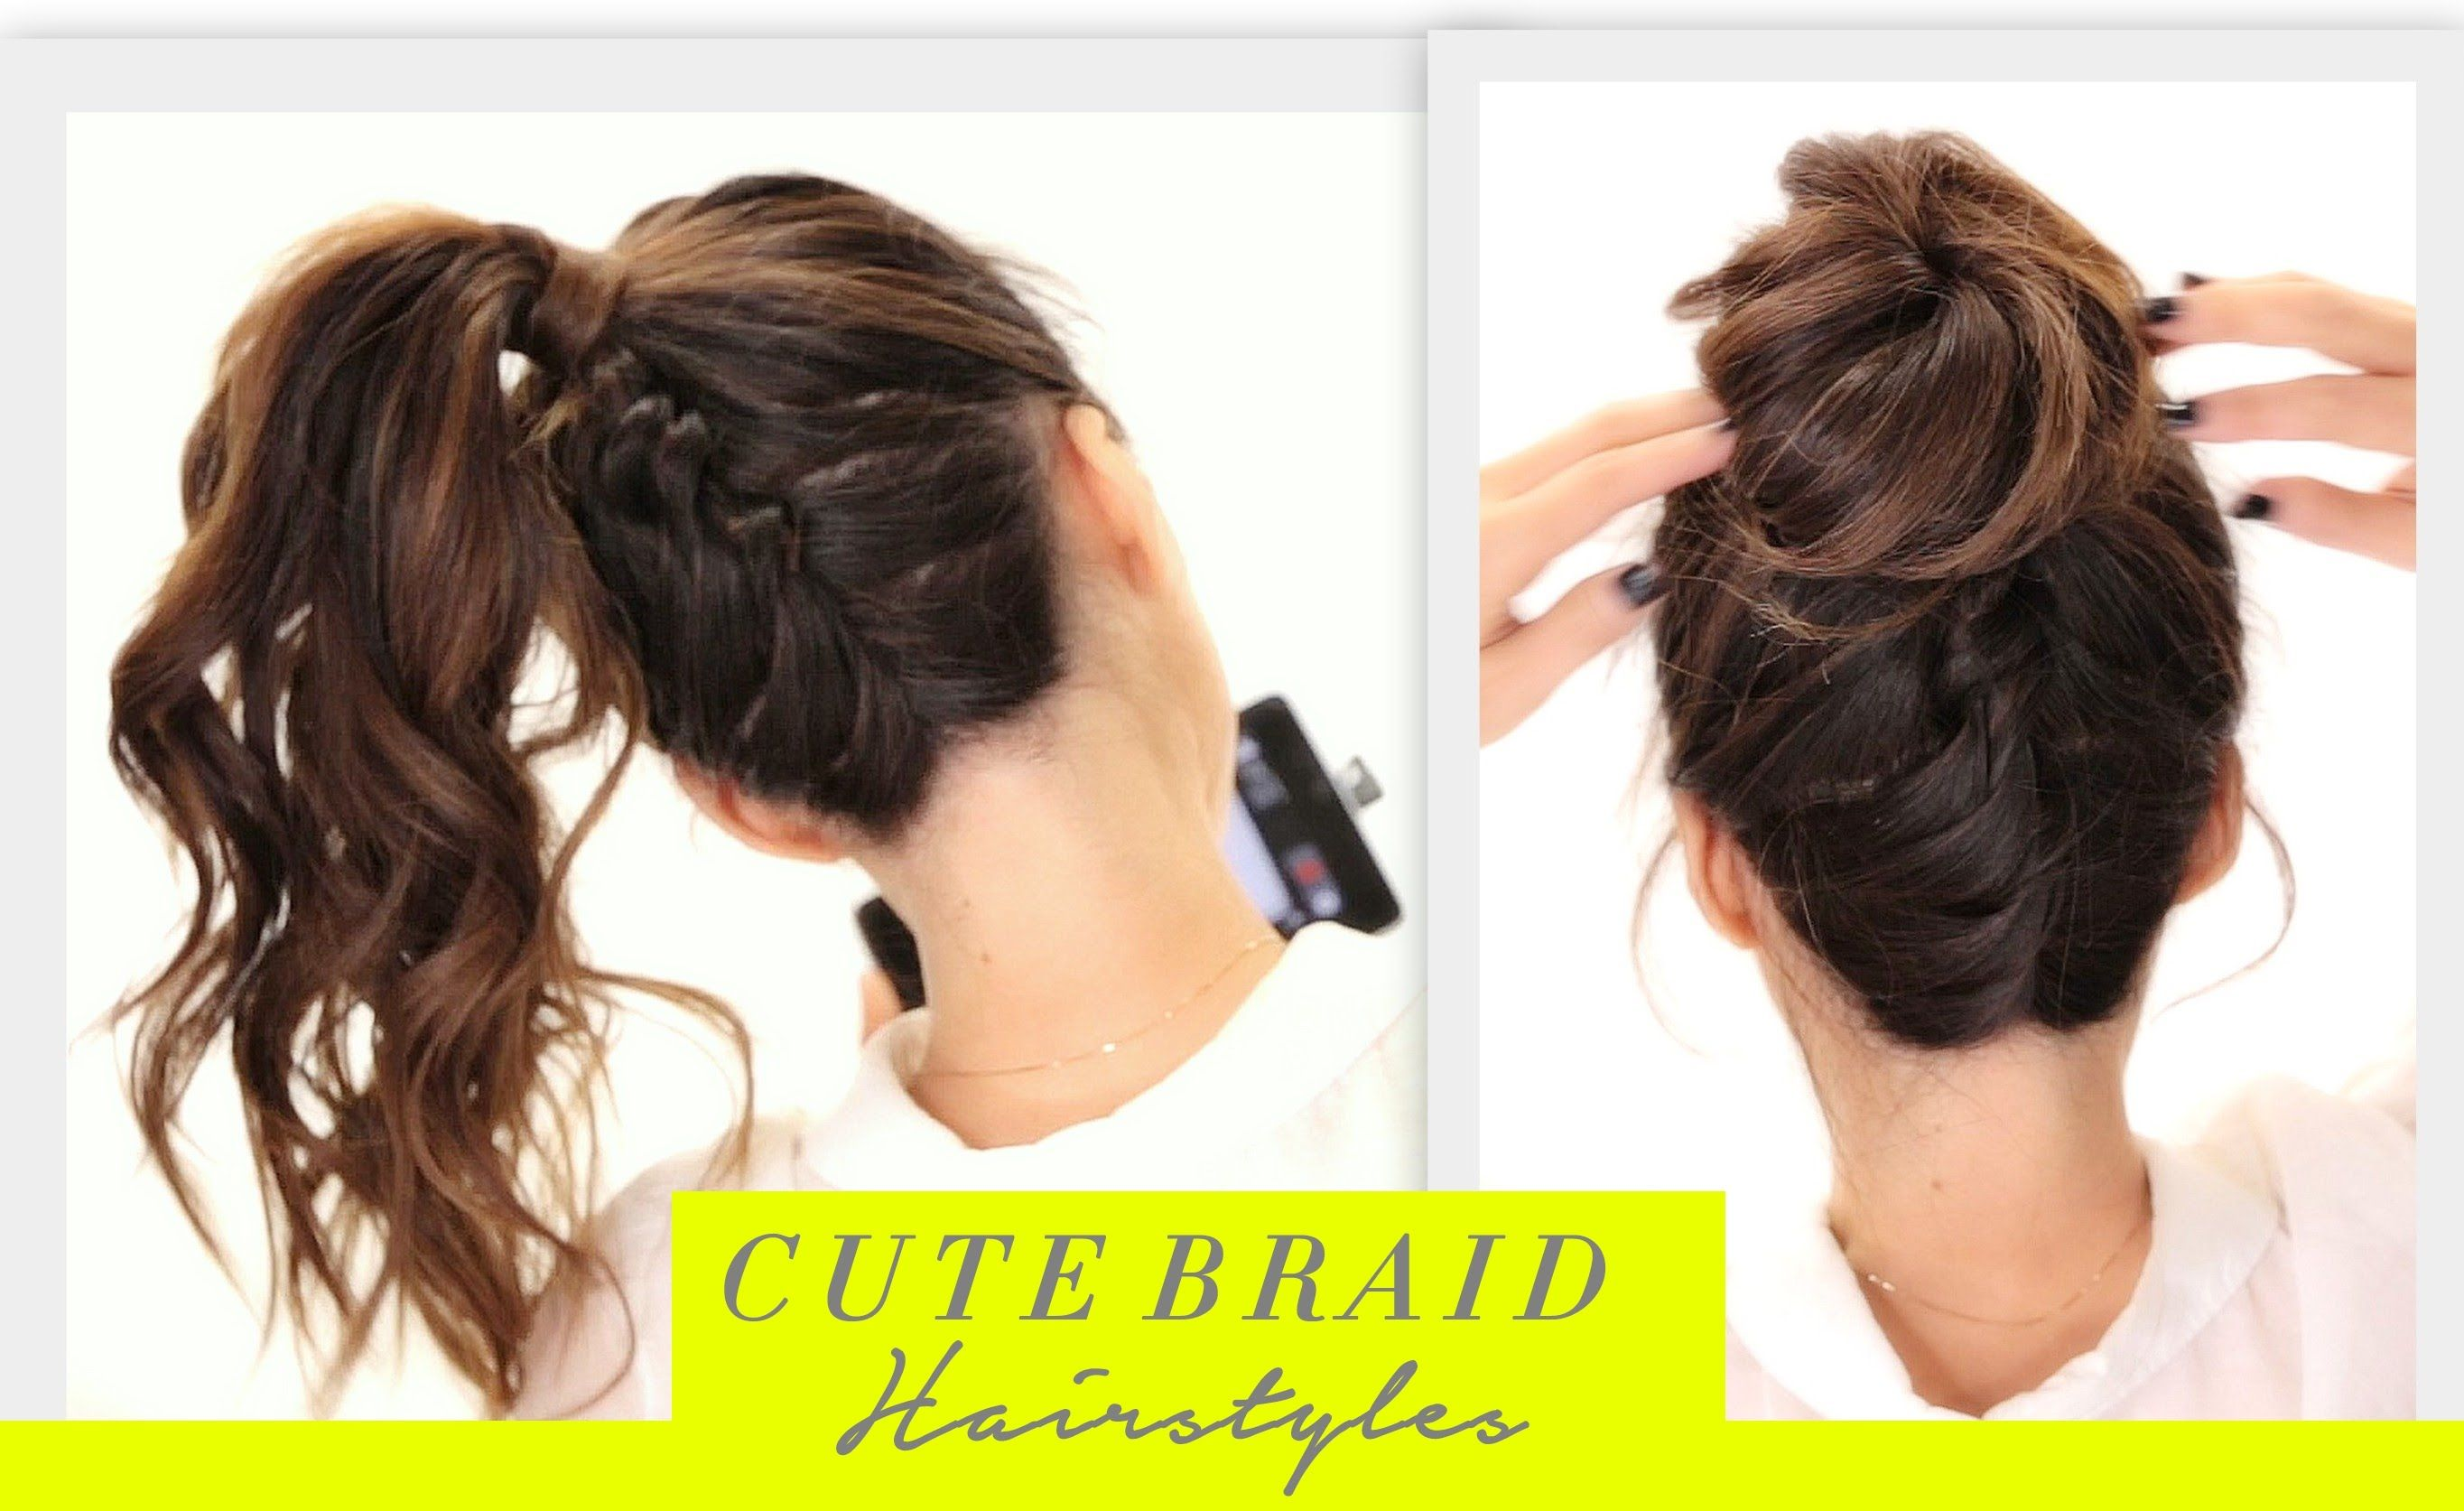 Cute Back To School Hairstyles Braided Ponytail Into A Big Messy Bun Hair Tutorial Bun Styl Braided Hairstyles Bun Hairstyles Cool Braid Hairstyles